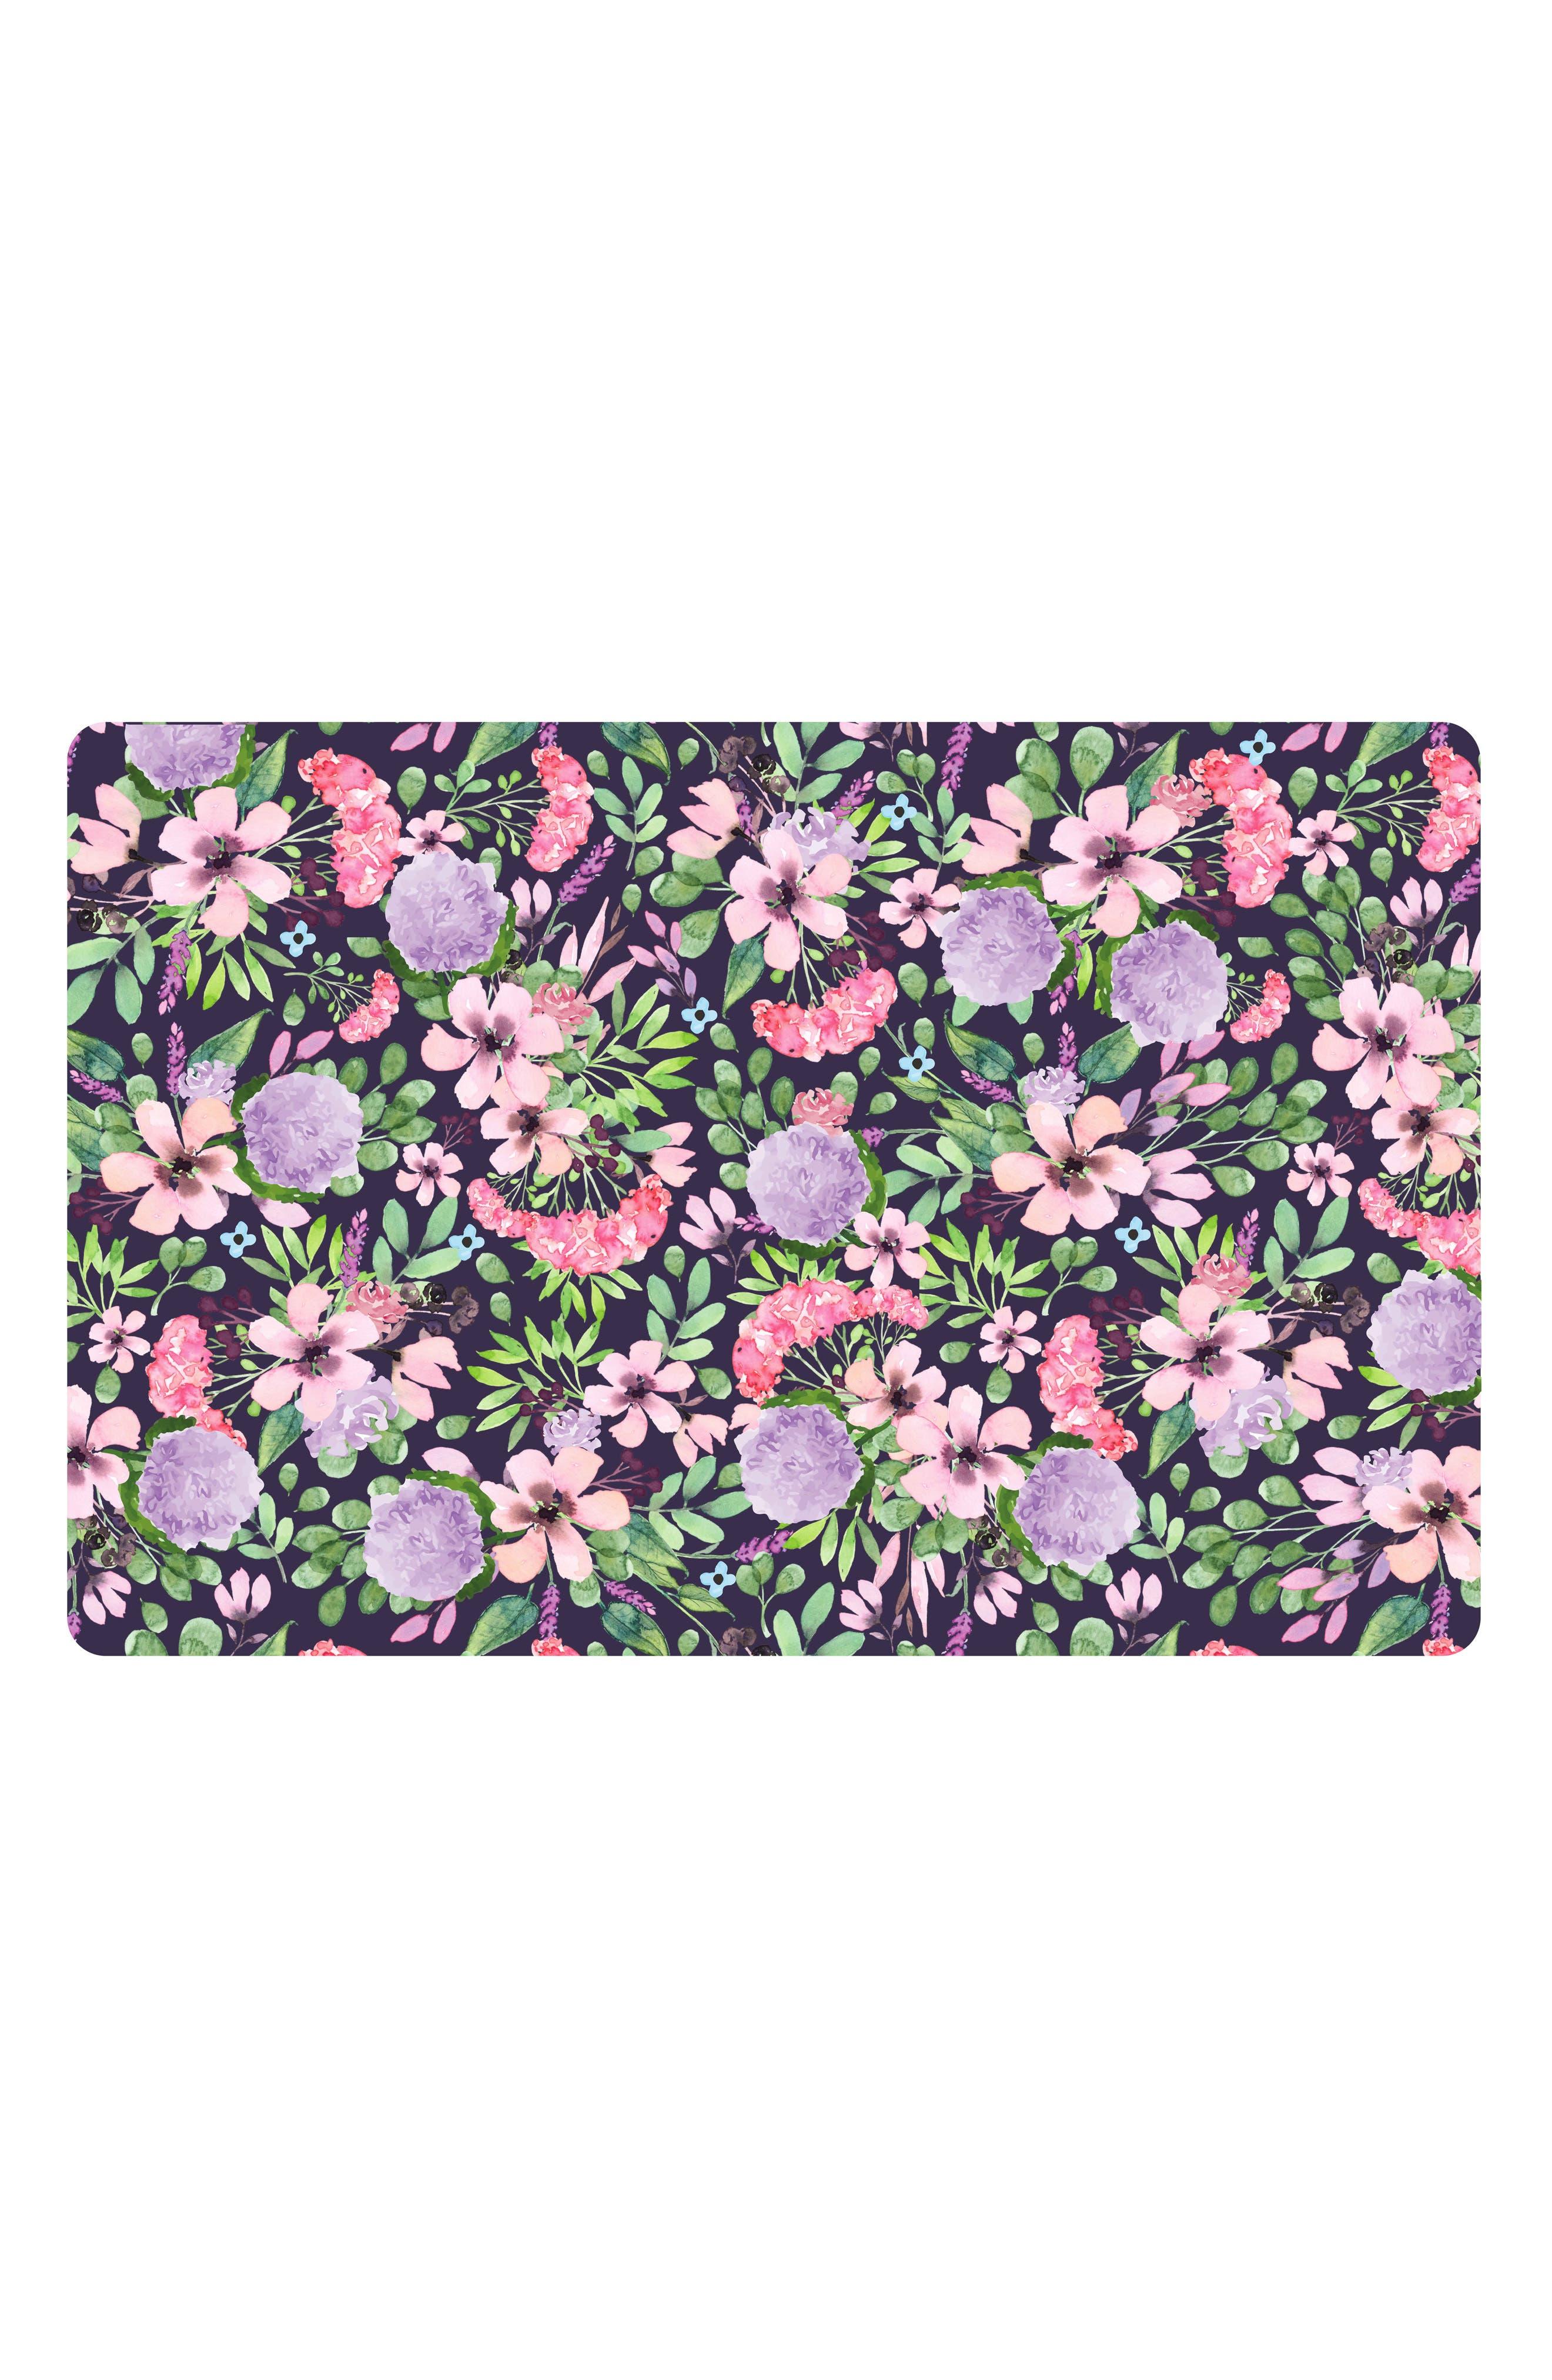 Floral Medley Monthly Memory Blanket & Swaddle Set,                             Main thumbnail 1, color,                             FLORAL MEDLEY